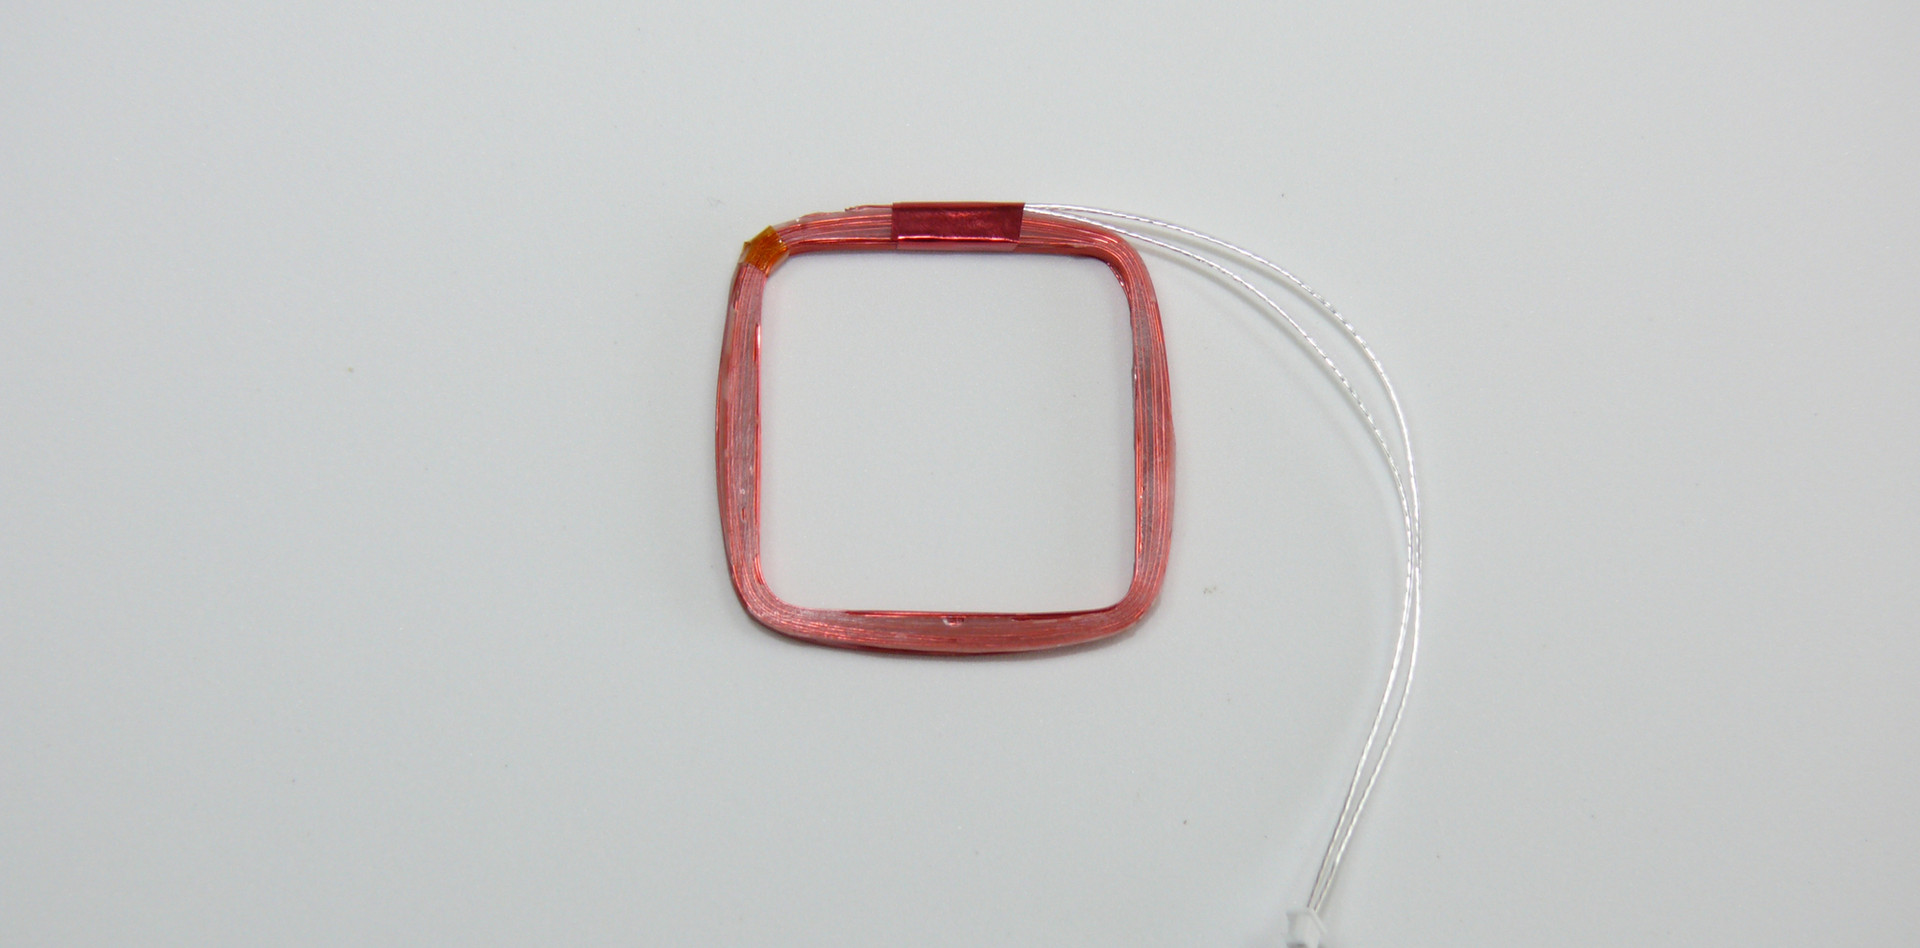 MT01 Compact Magnetorquer